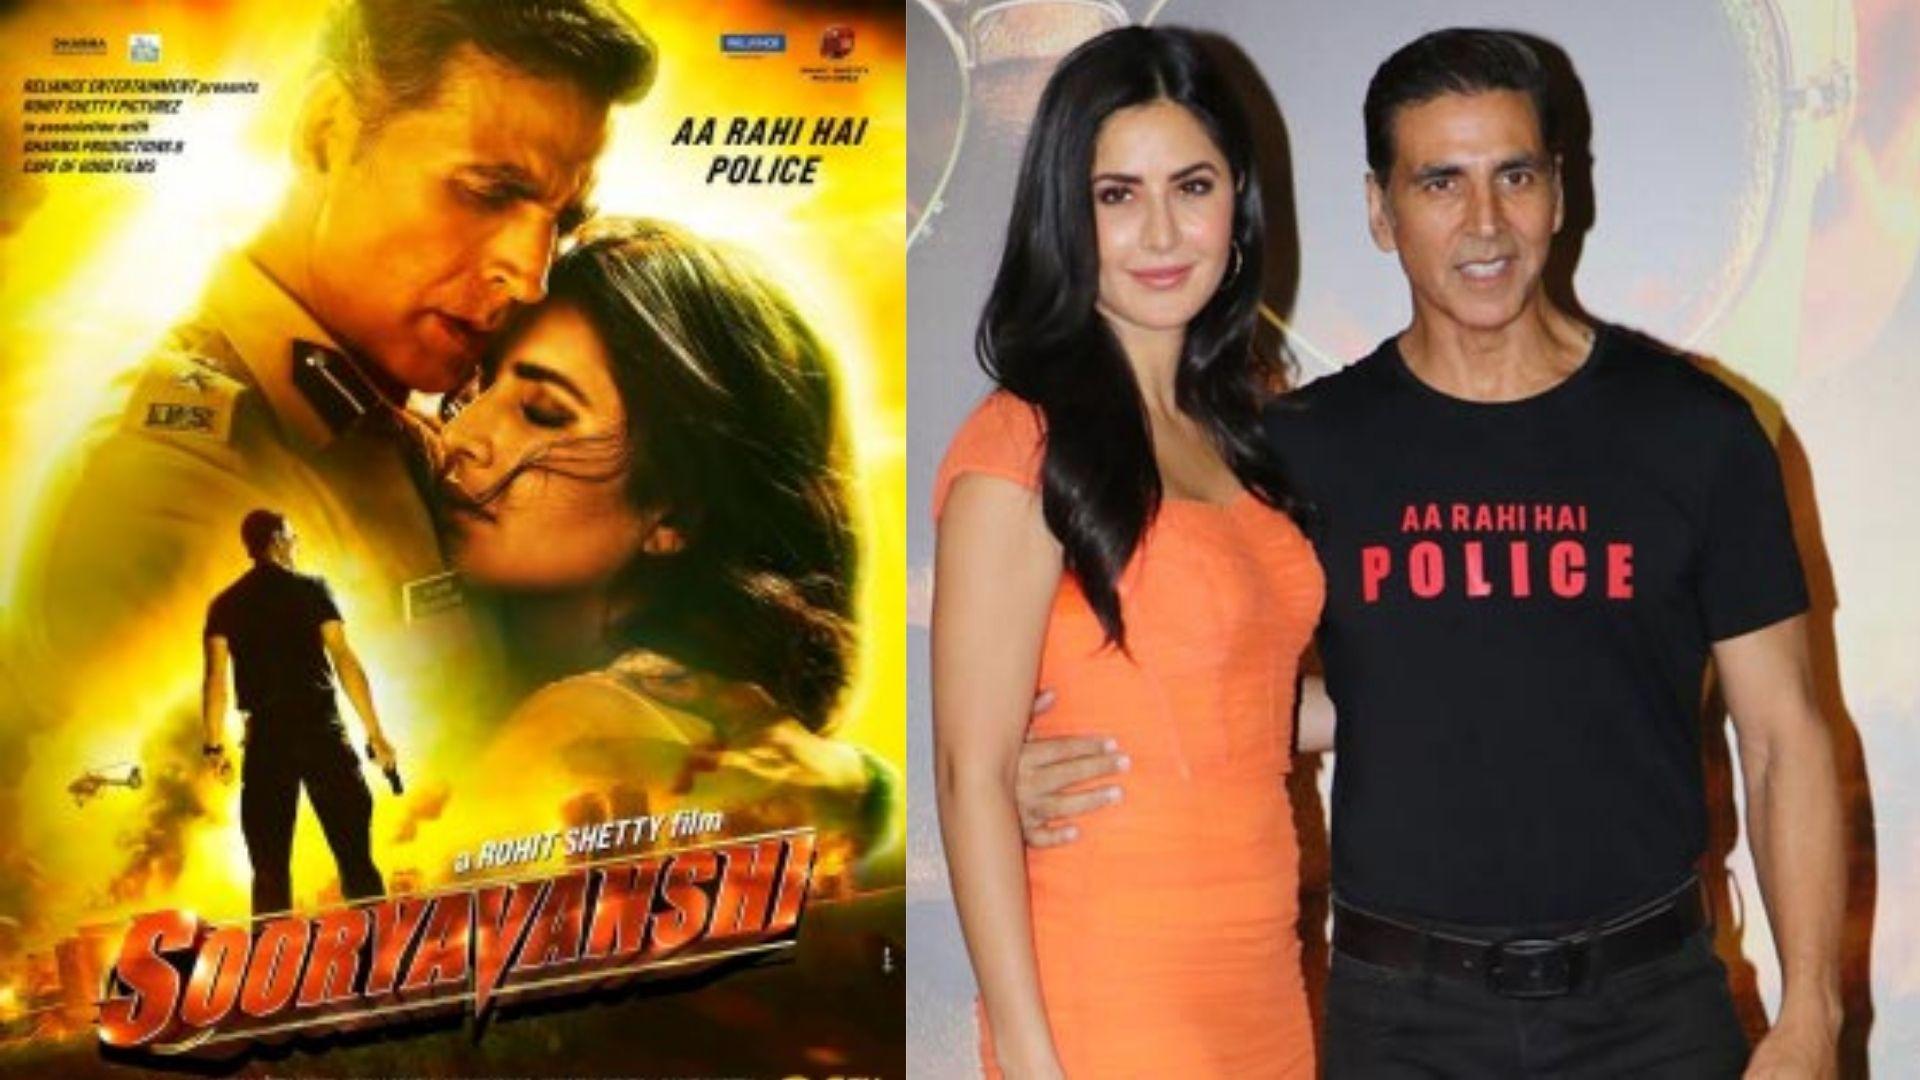 Sooryavanshi: Akshay Kumar And Katrina Kaif Starrer Gets This Approval From The Censor Board